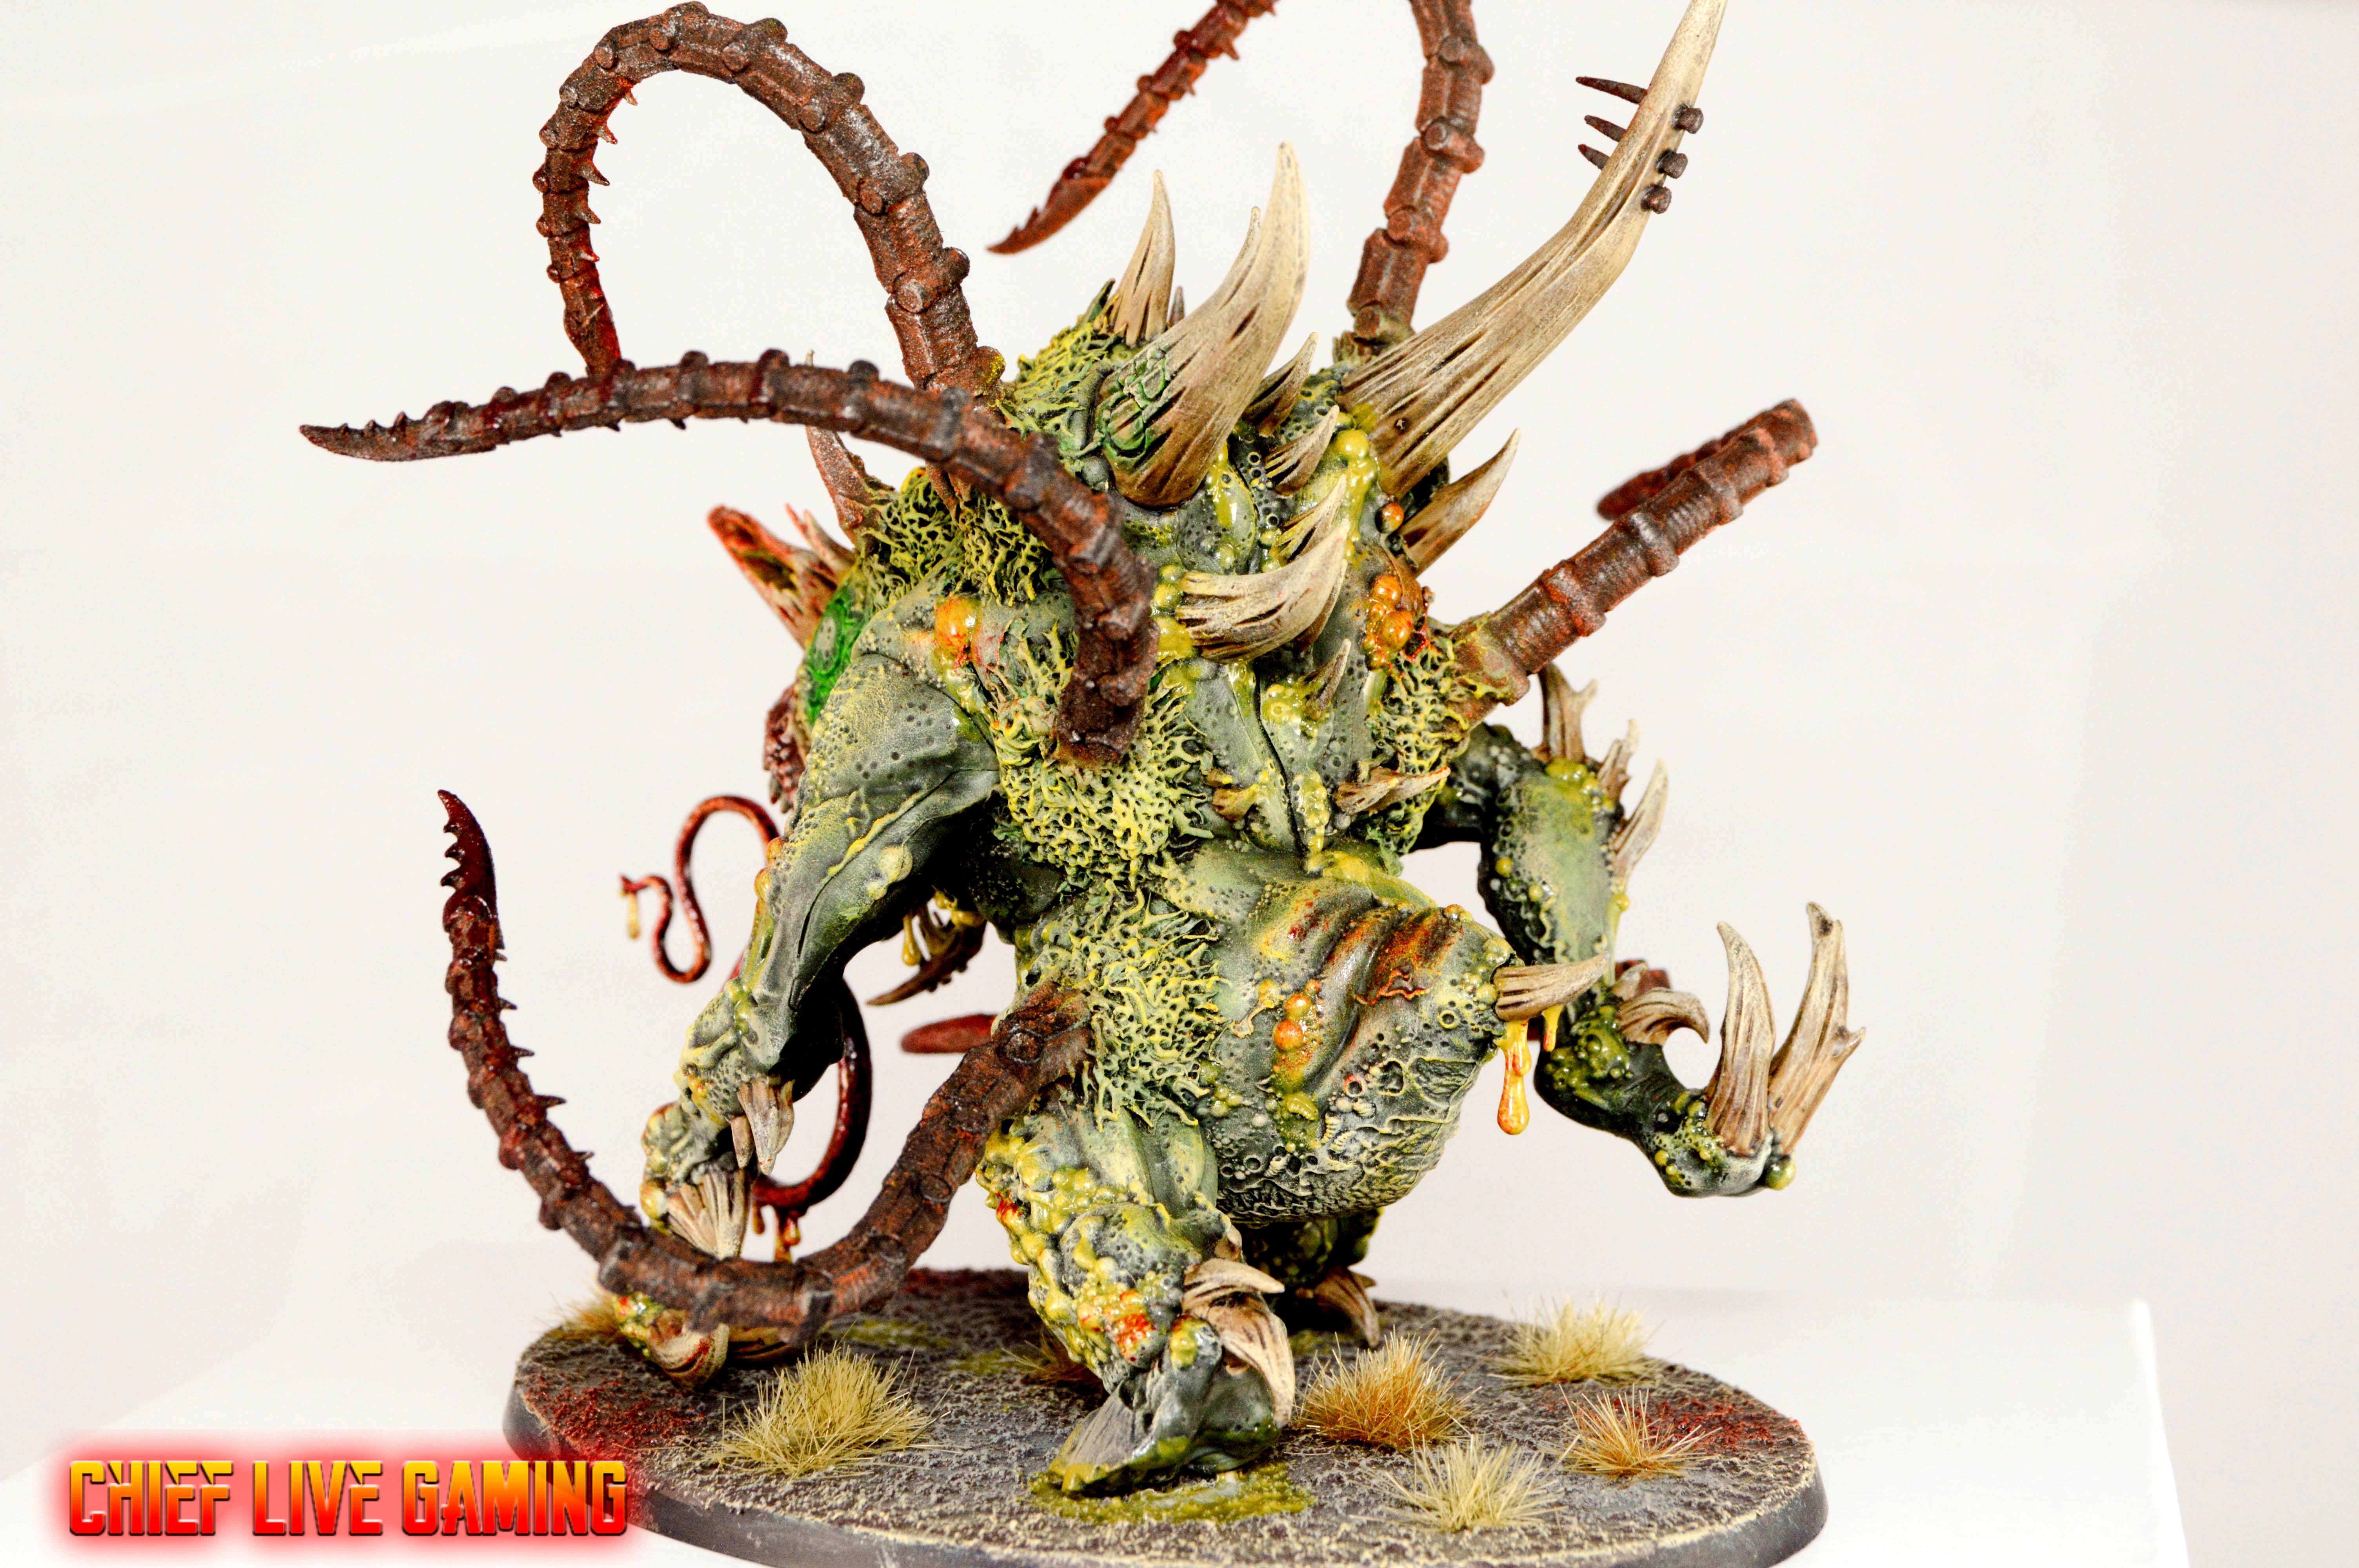 Chaos, Conversion, Cusom, Daemons, Greenstuff, Kitbash, Nurgle, Painting, Space Marines, Warhammer 40,000, Warhammer Fantasy